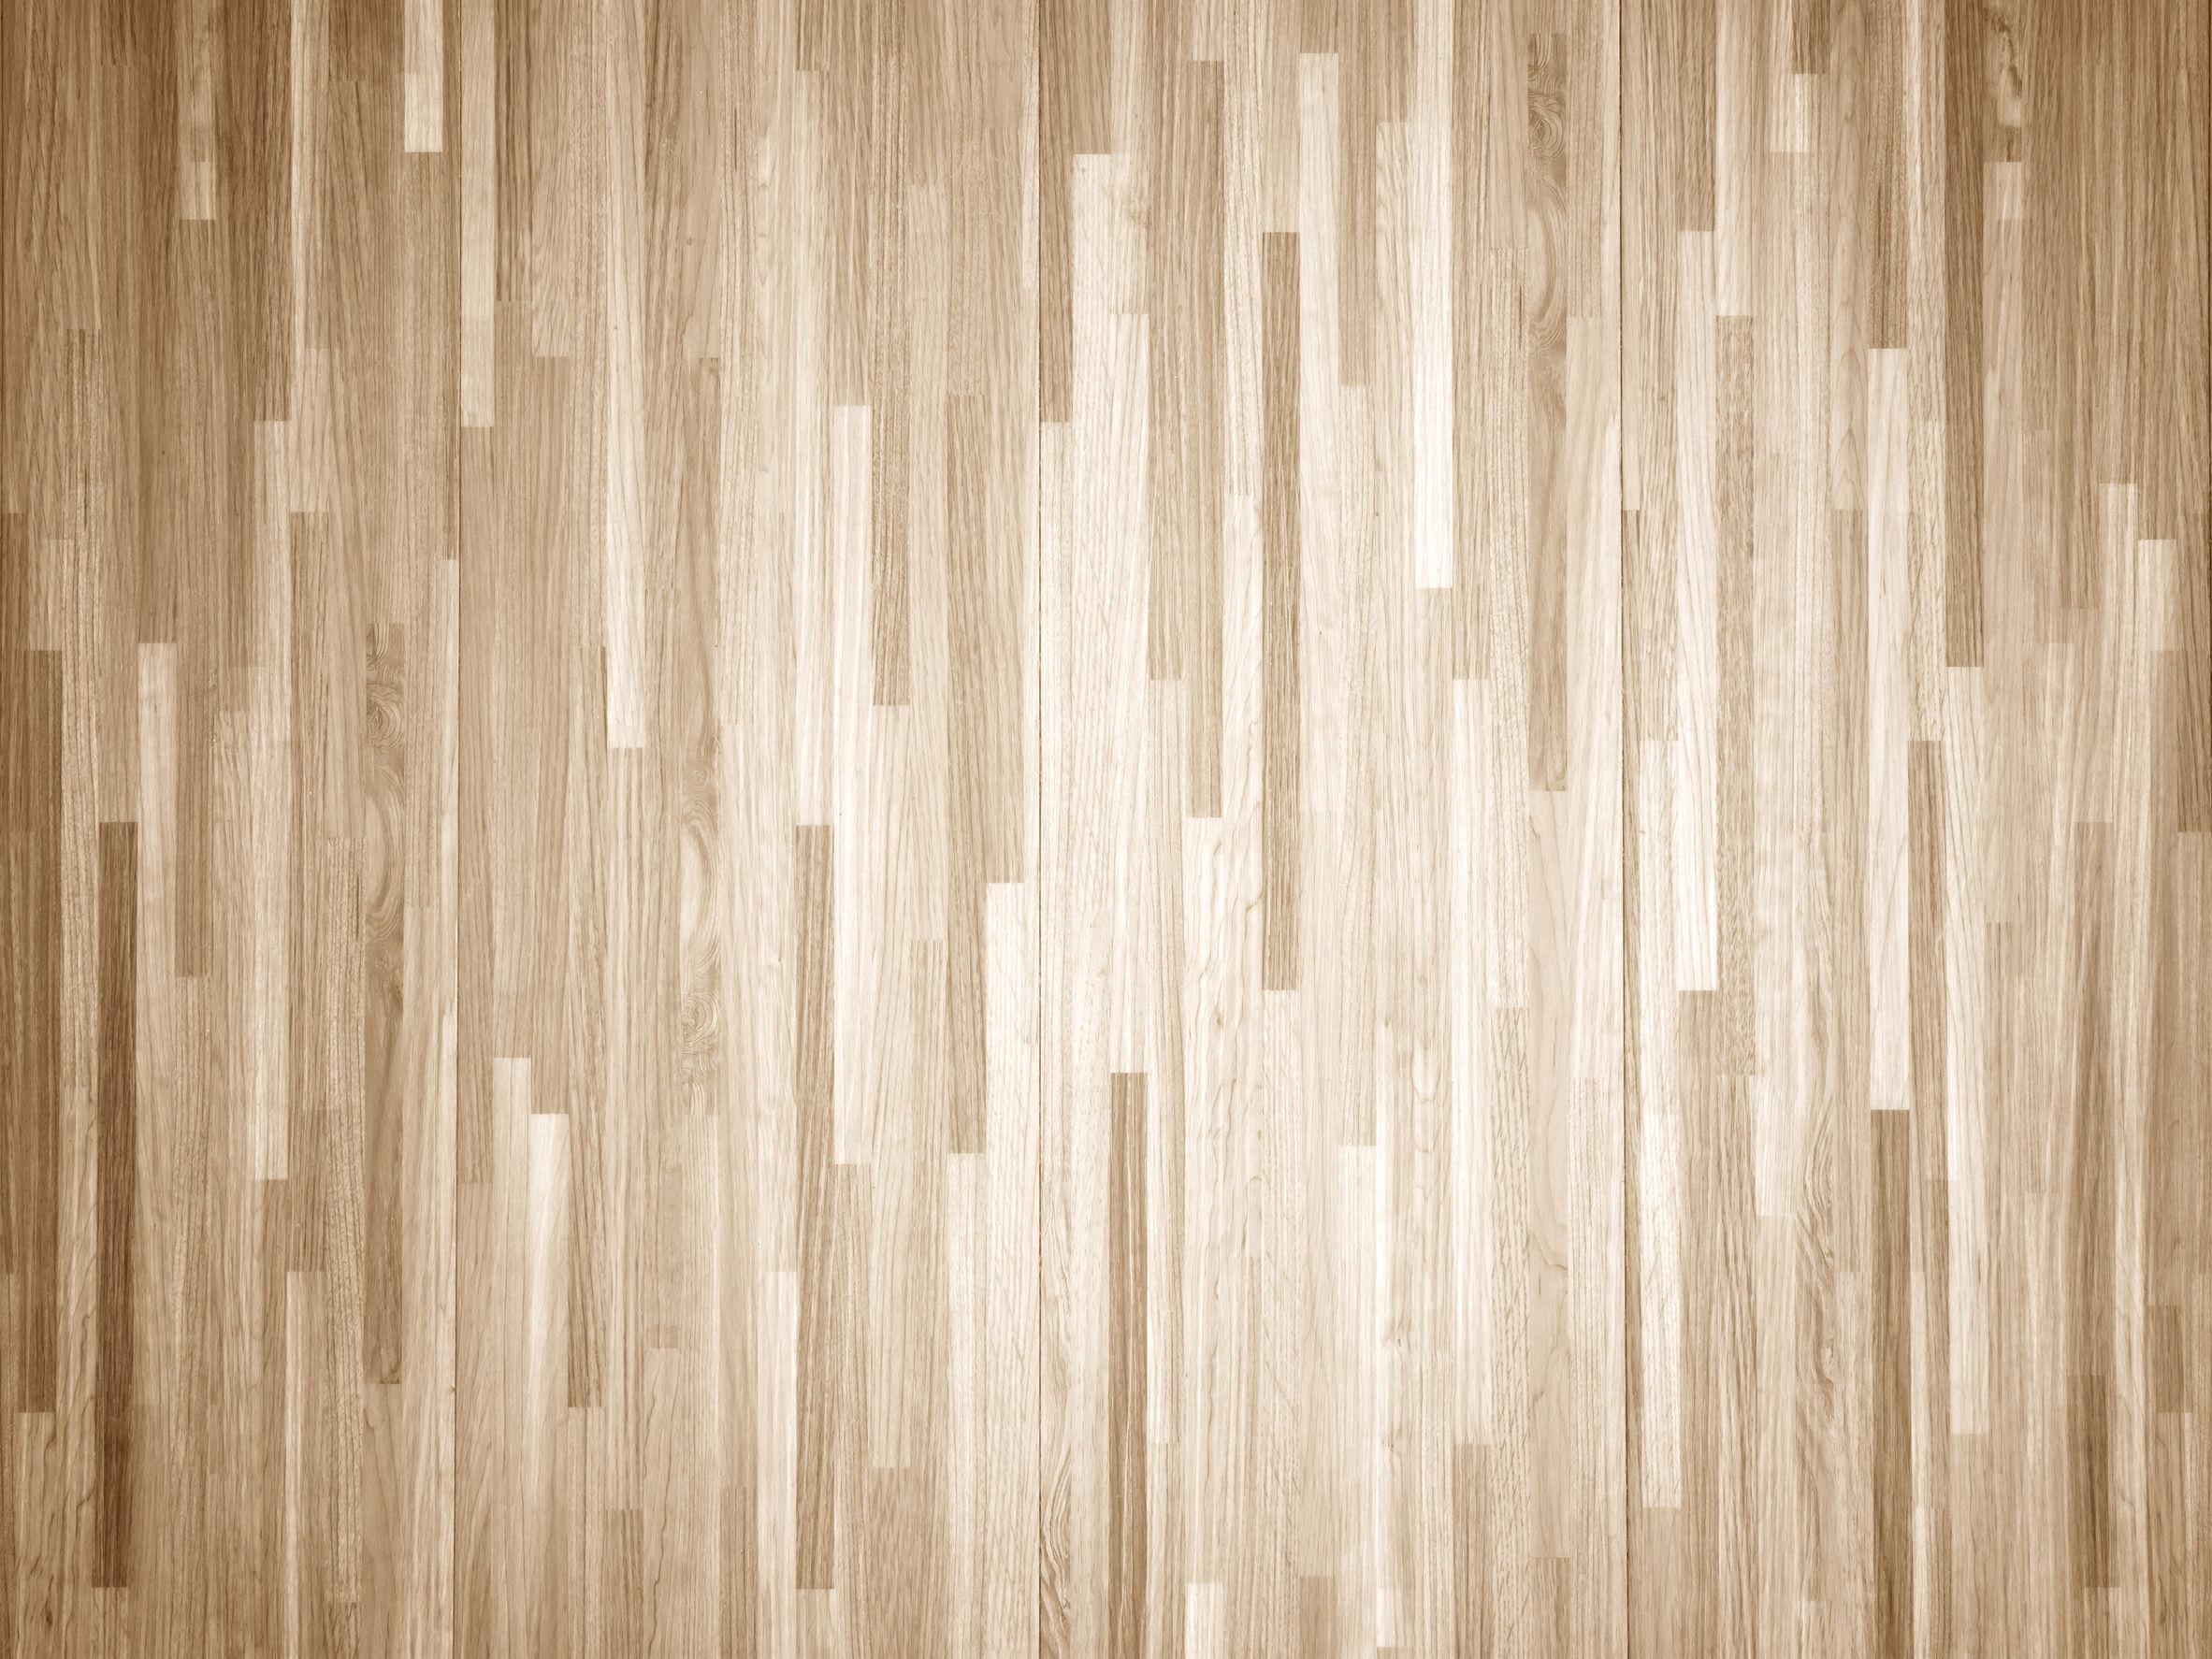 How To Chemically Strip Wood Floors Woodfloordoctor Com